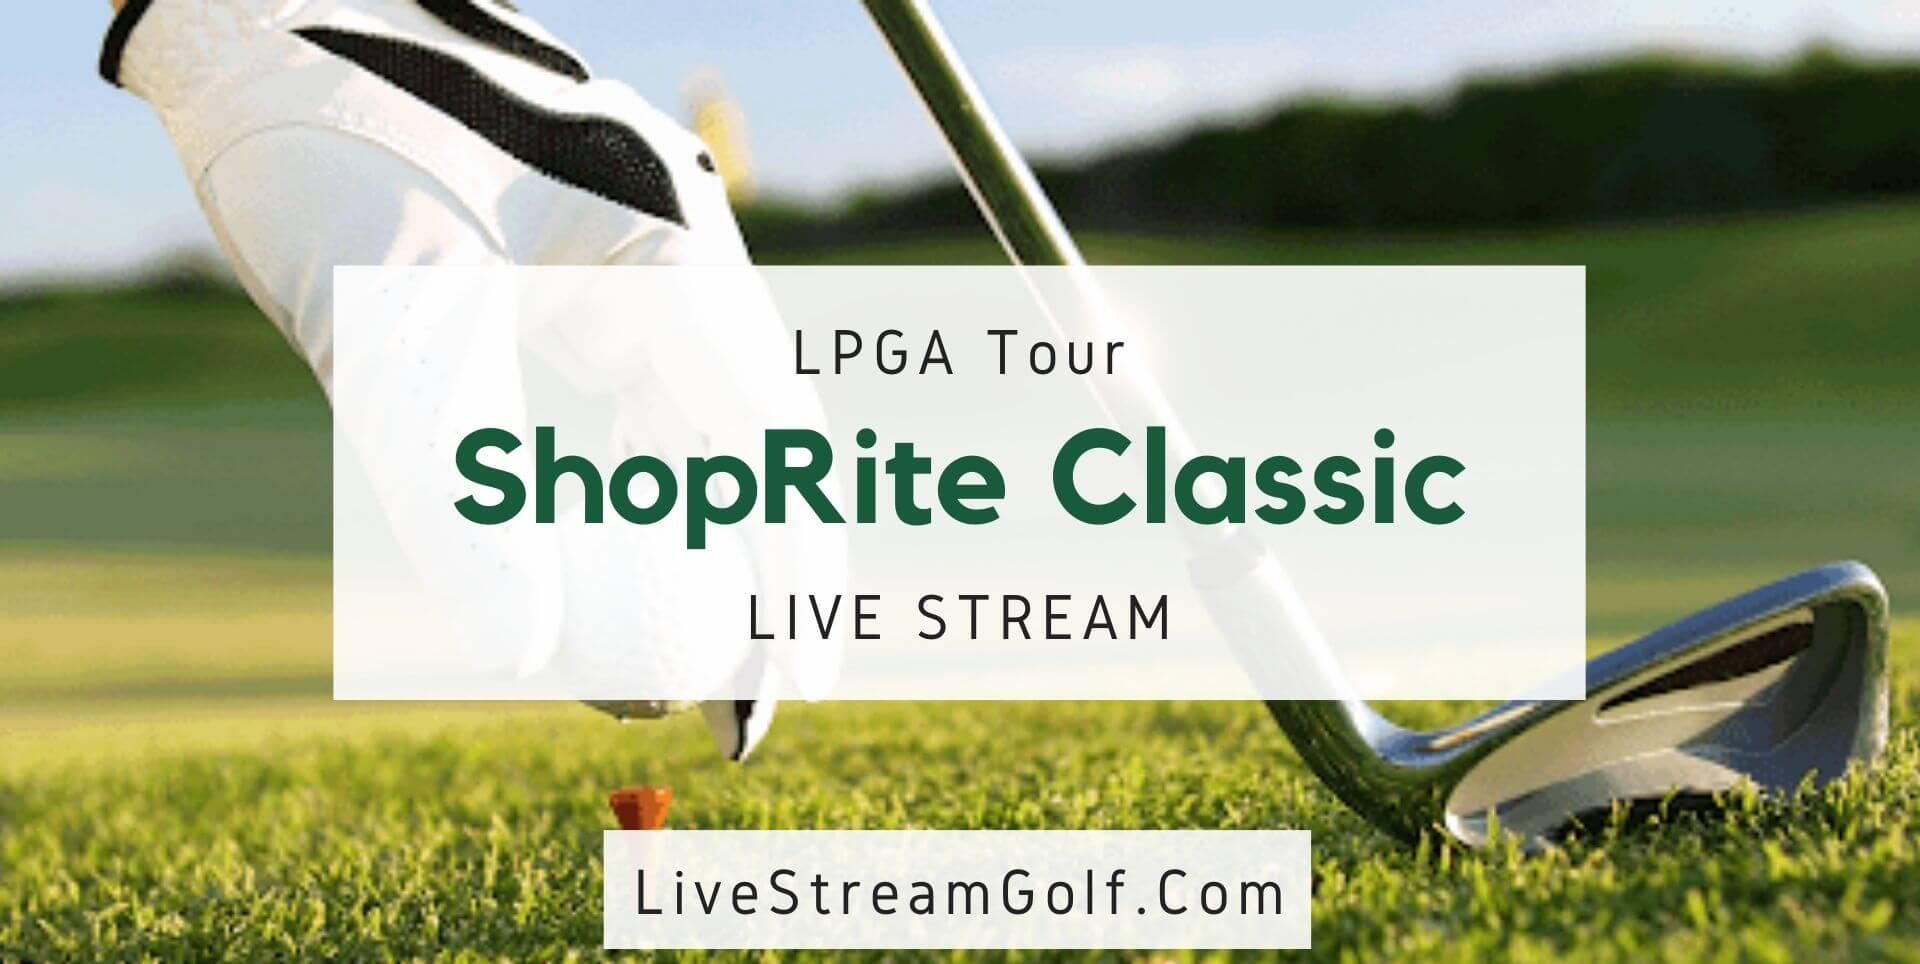 ShopRite Classic Rd 1 Live Stream 2021: LPGA Tour 2021